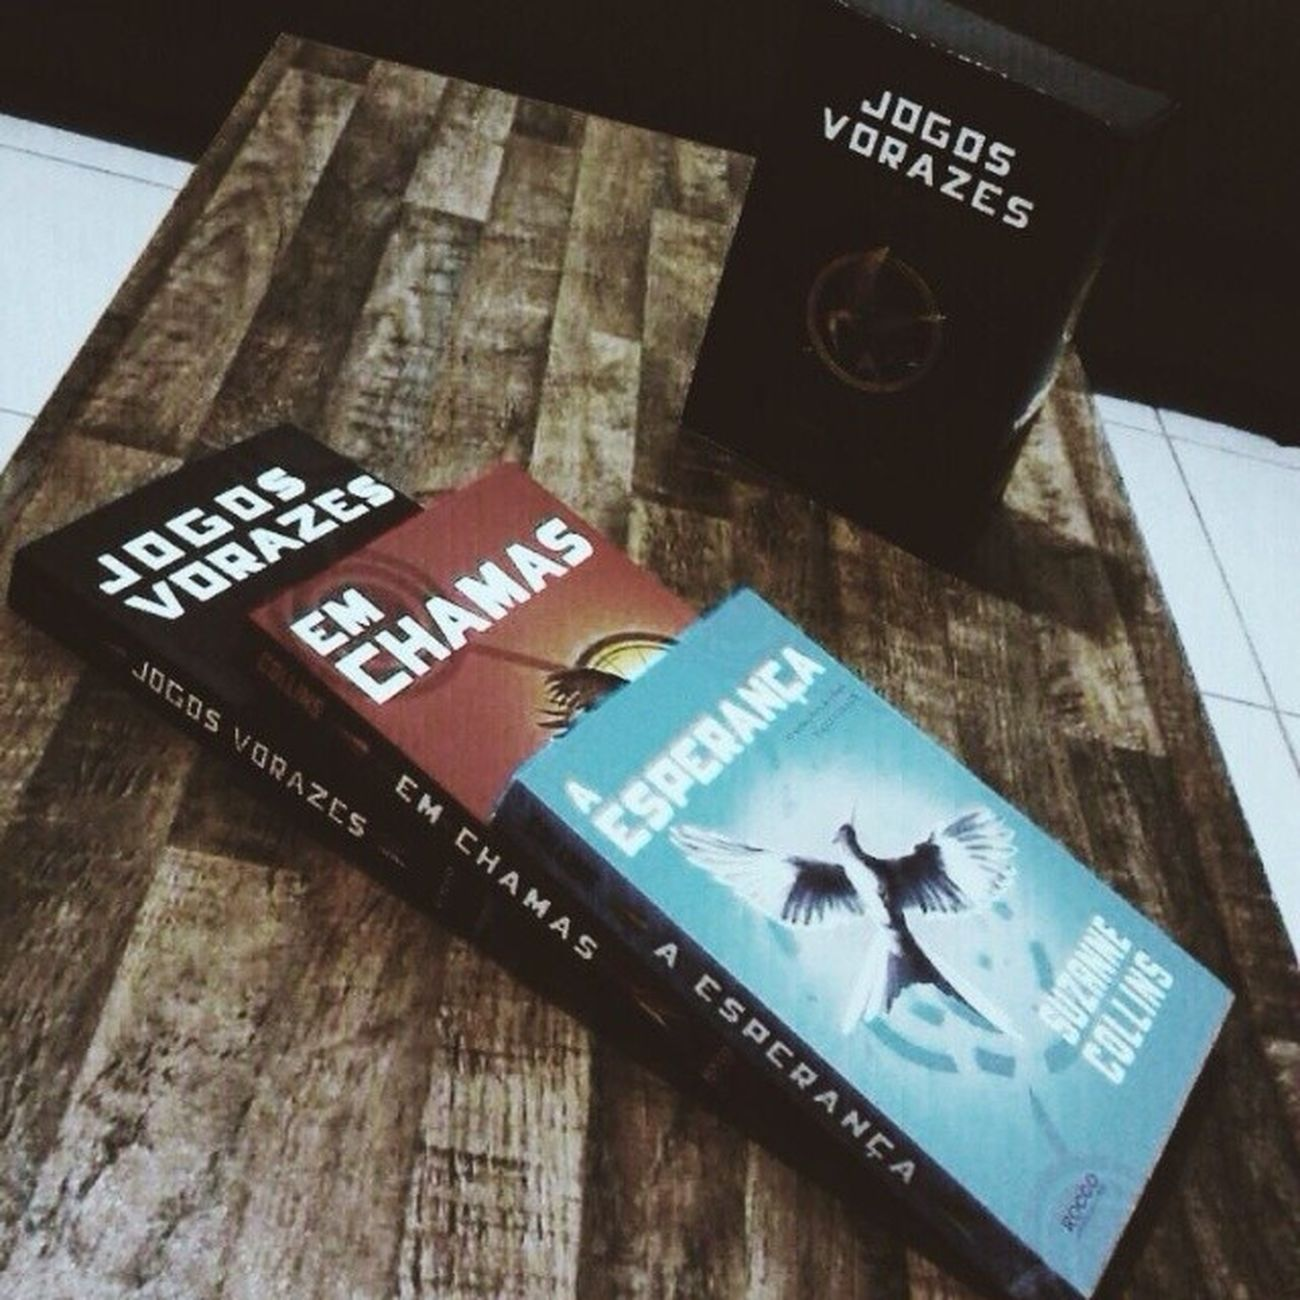 JogosVorazes TheHungarGames Emchamas Catchingfire AEsperanca Mockingjay Book Perfect Loved Beautiful Tribute SuzanneCollins Brazil lfl